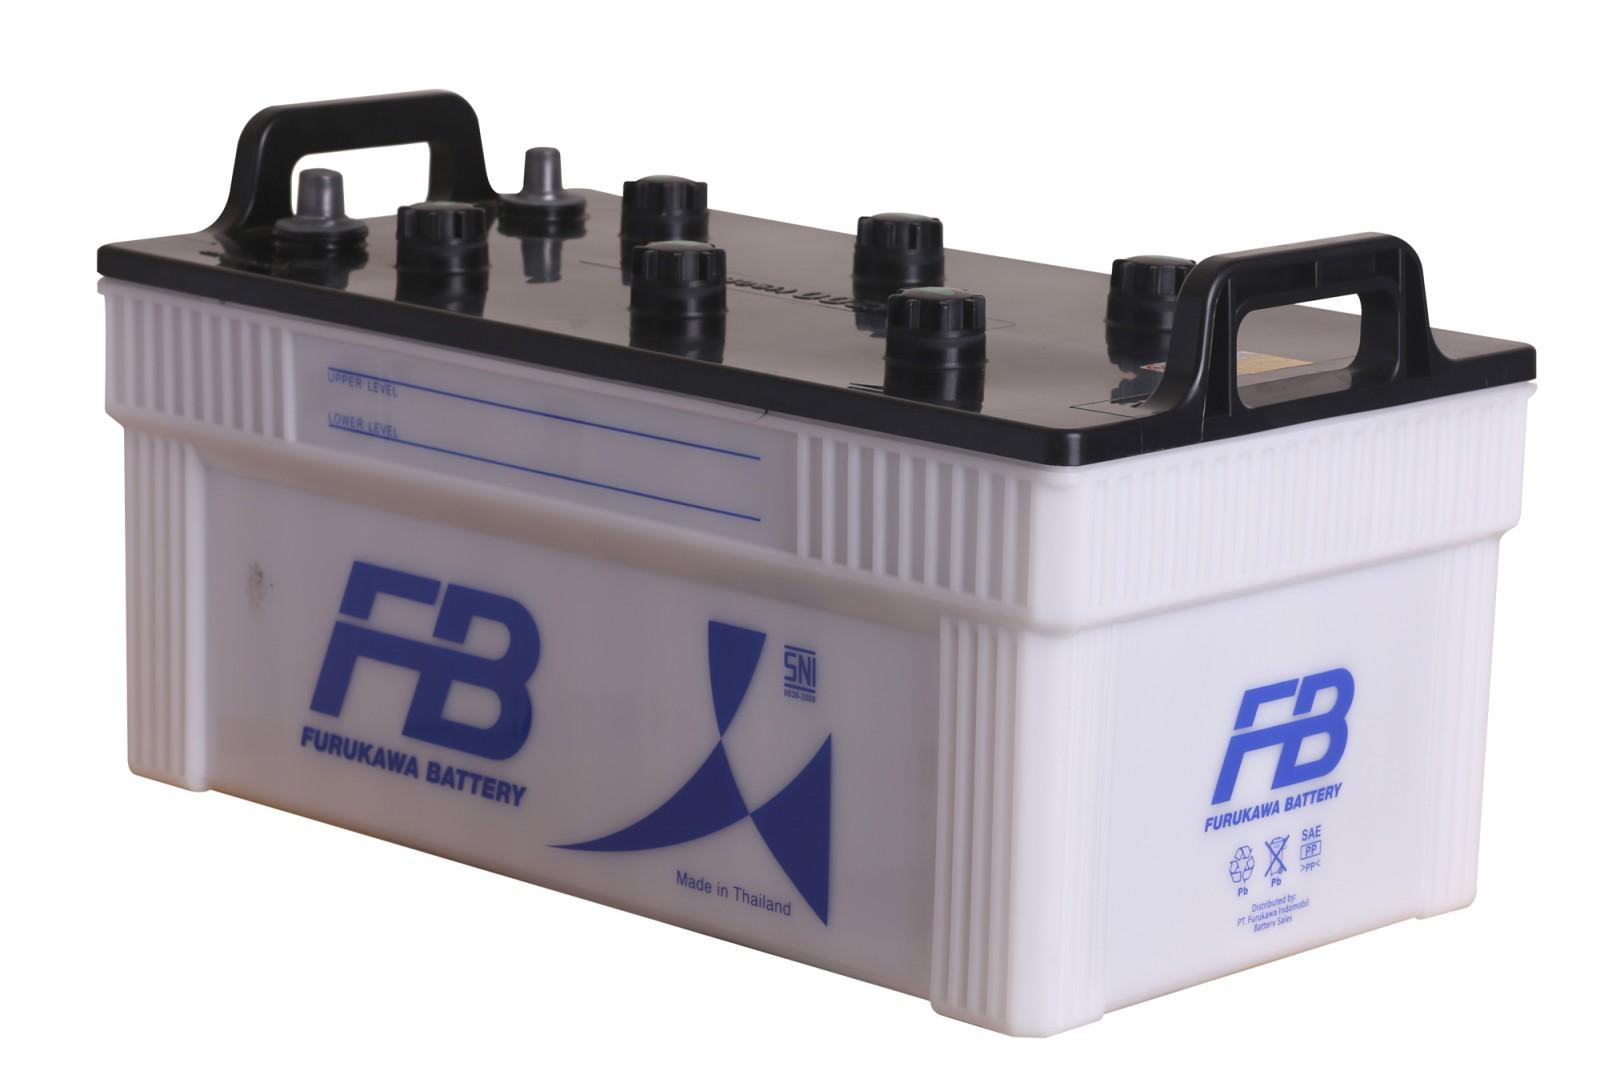 image Japanese racequeen furukawa battery